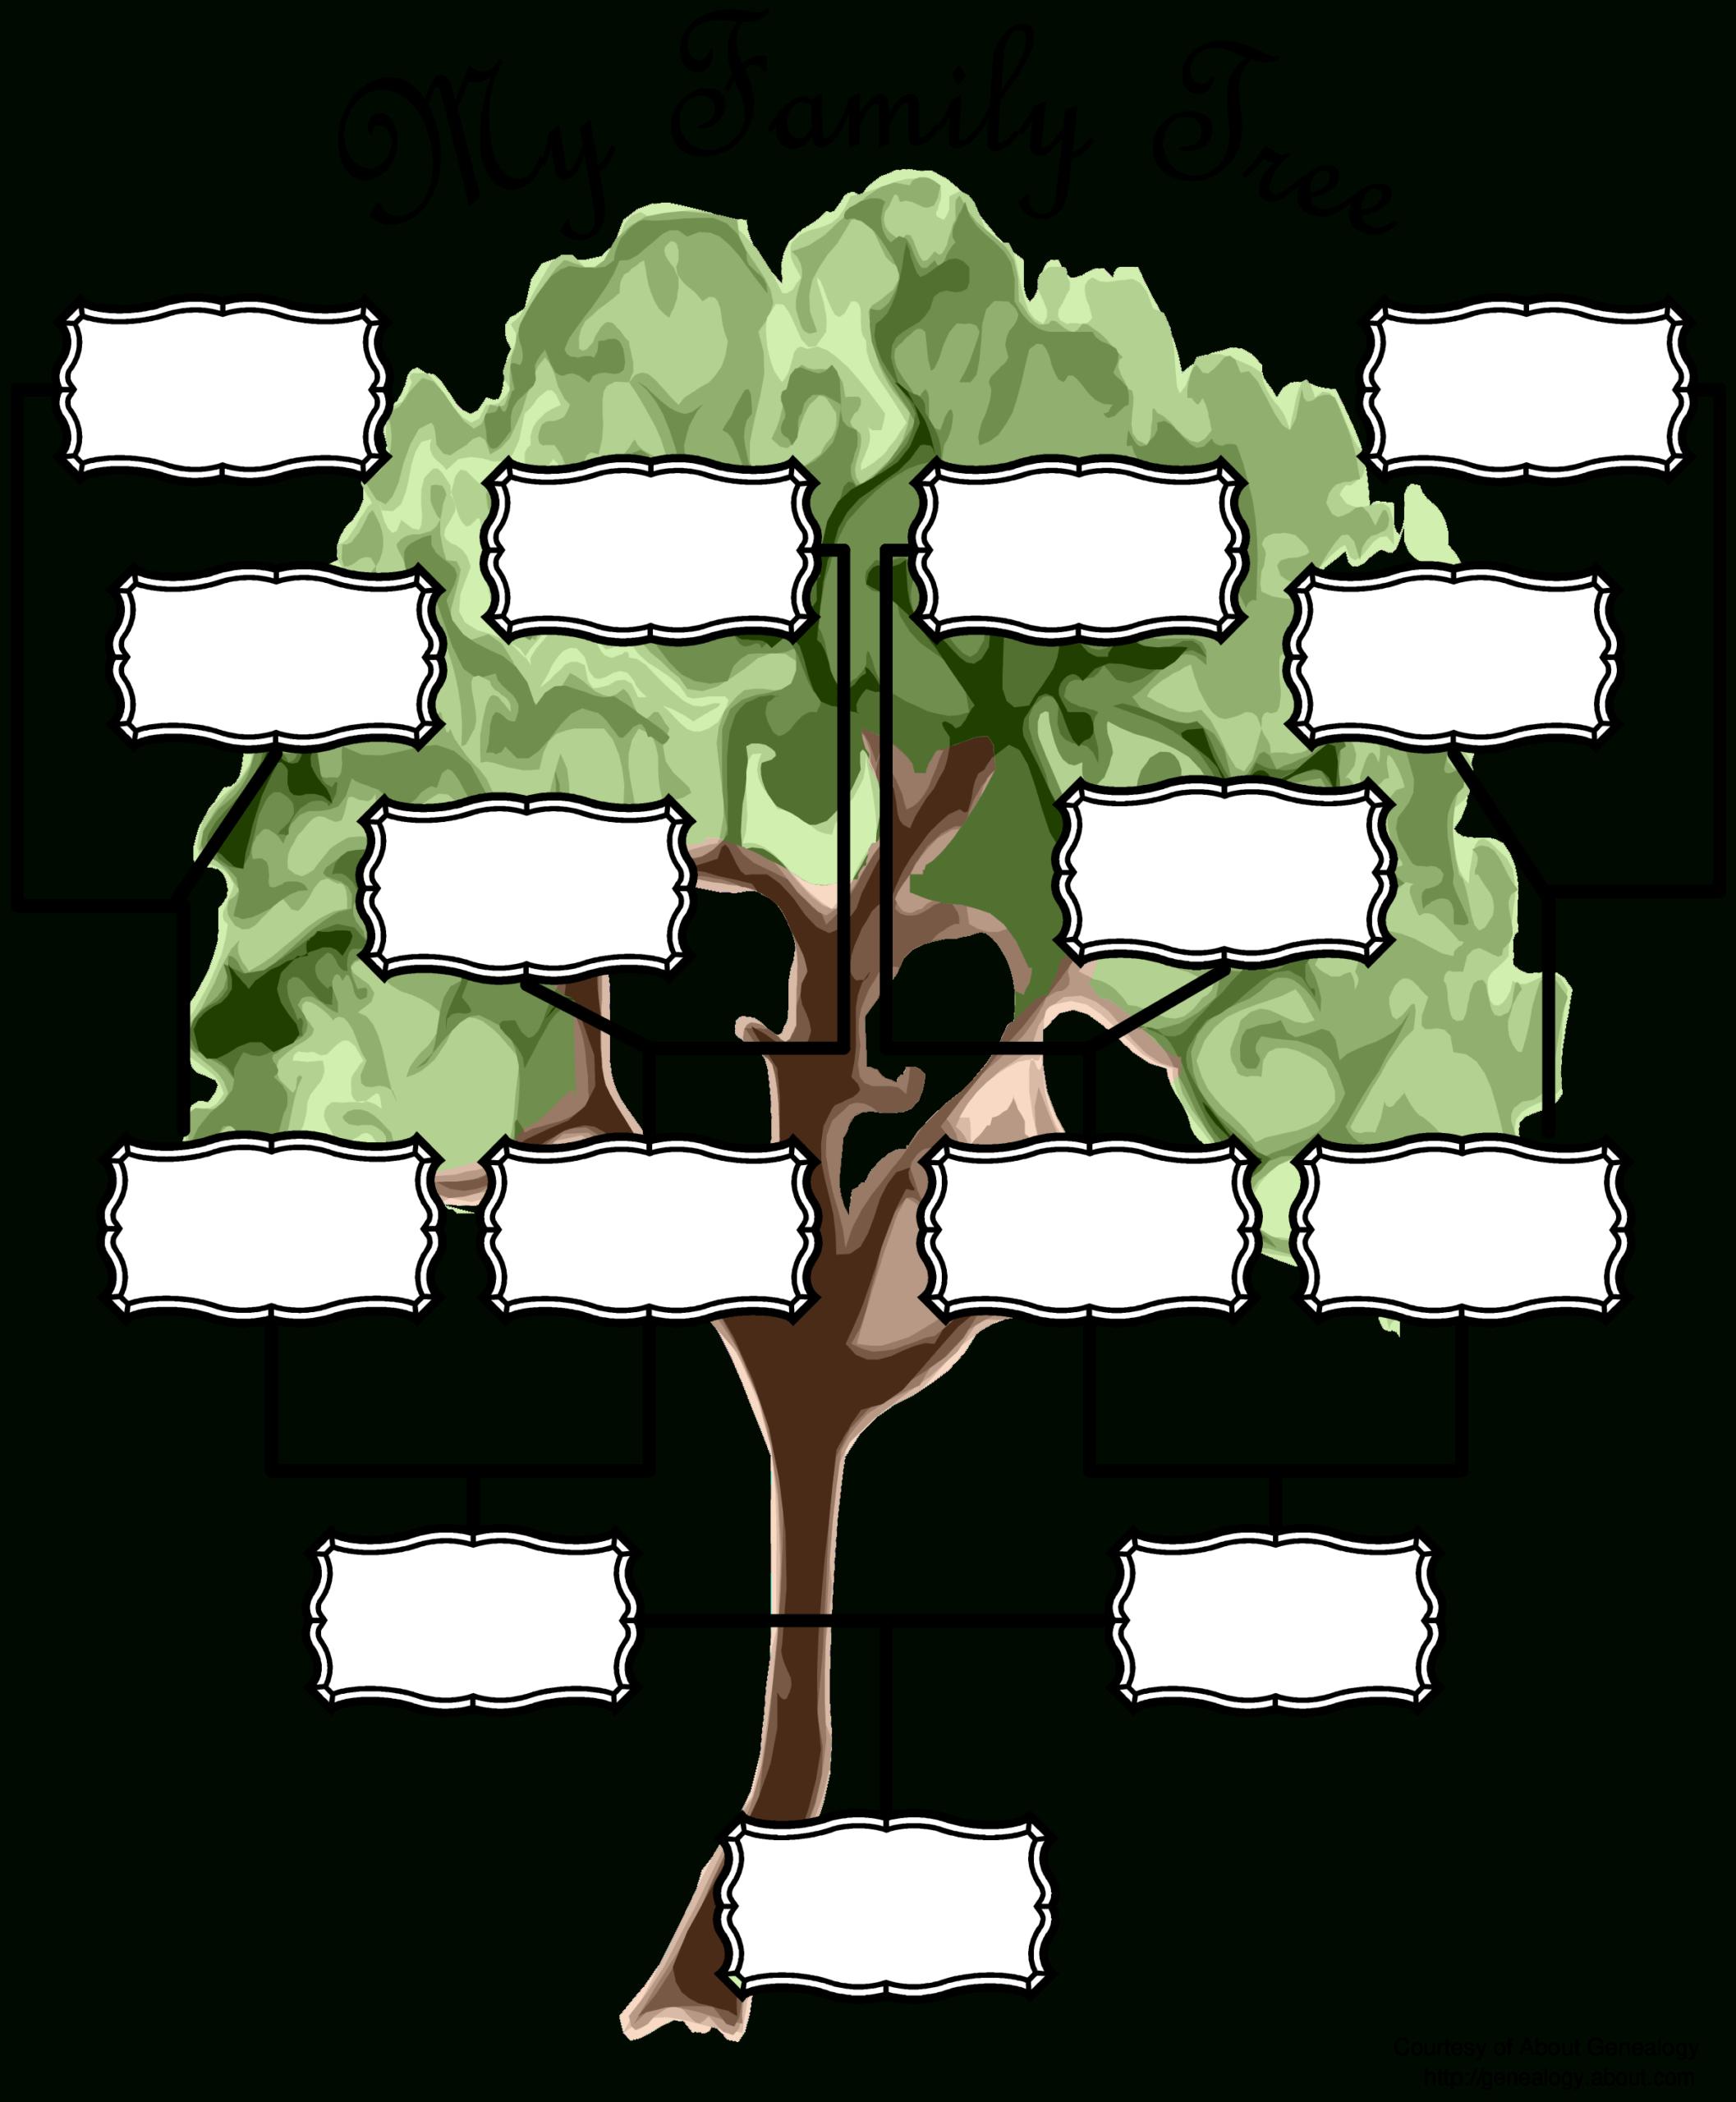 Blank Family Tree Chart   Templates At Allbusinesstemplates For Fill In The Blank Family Tree Template